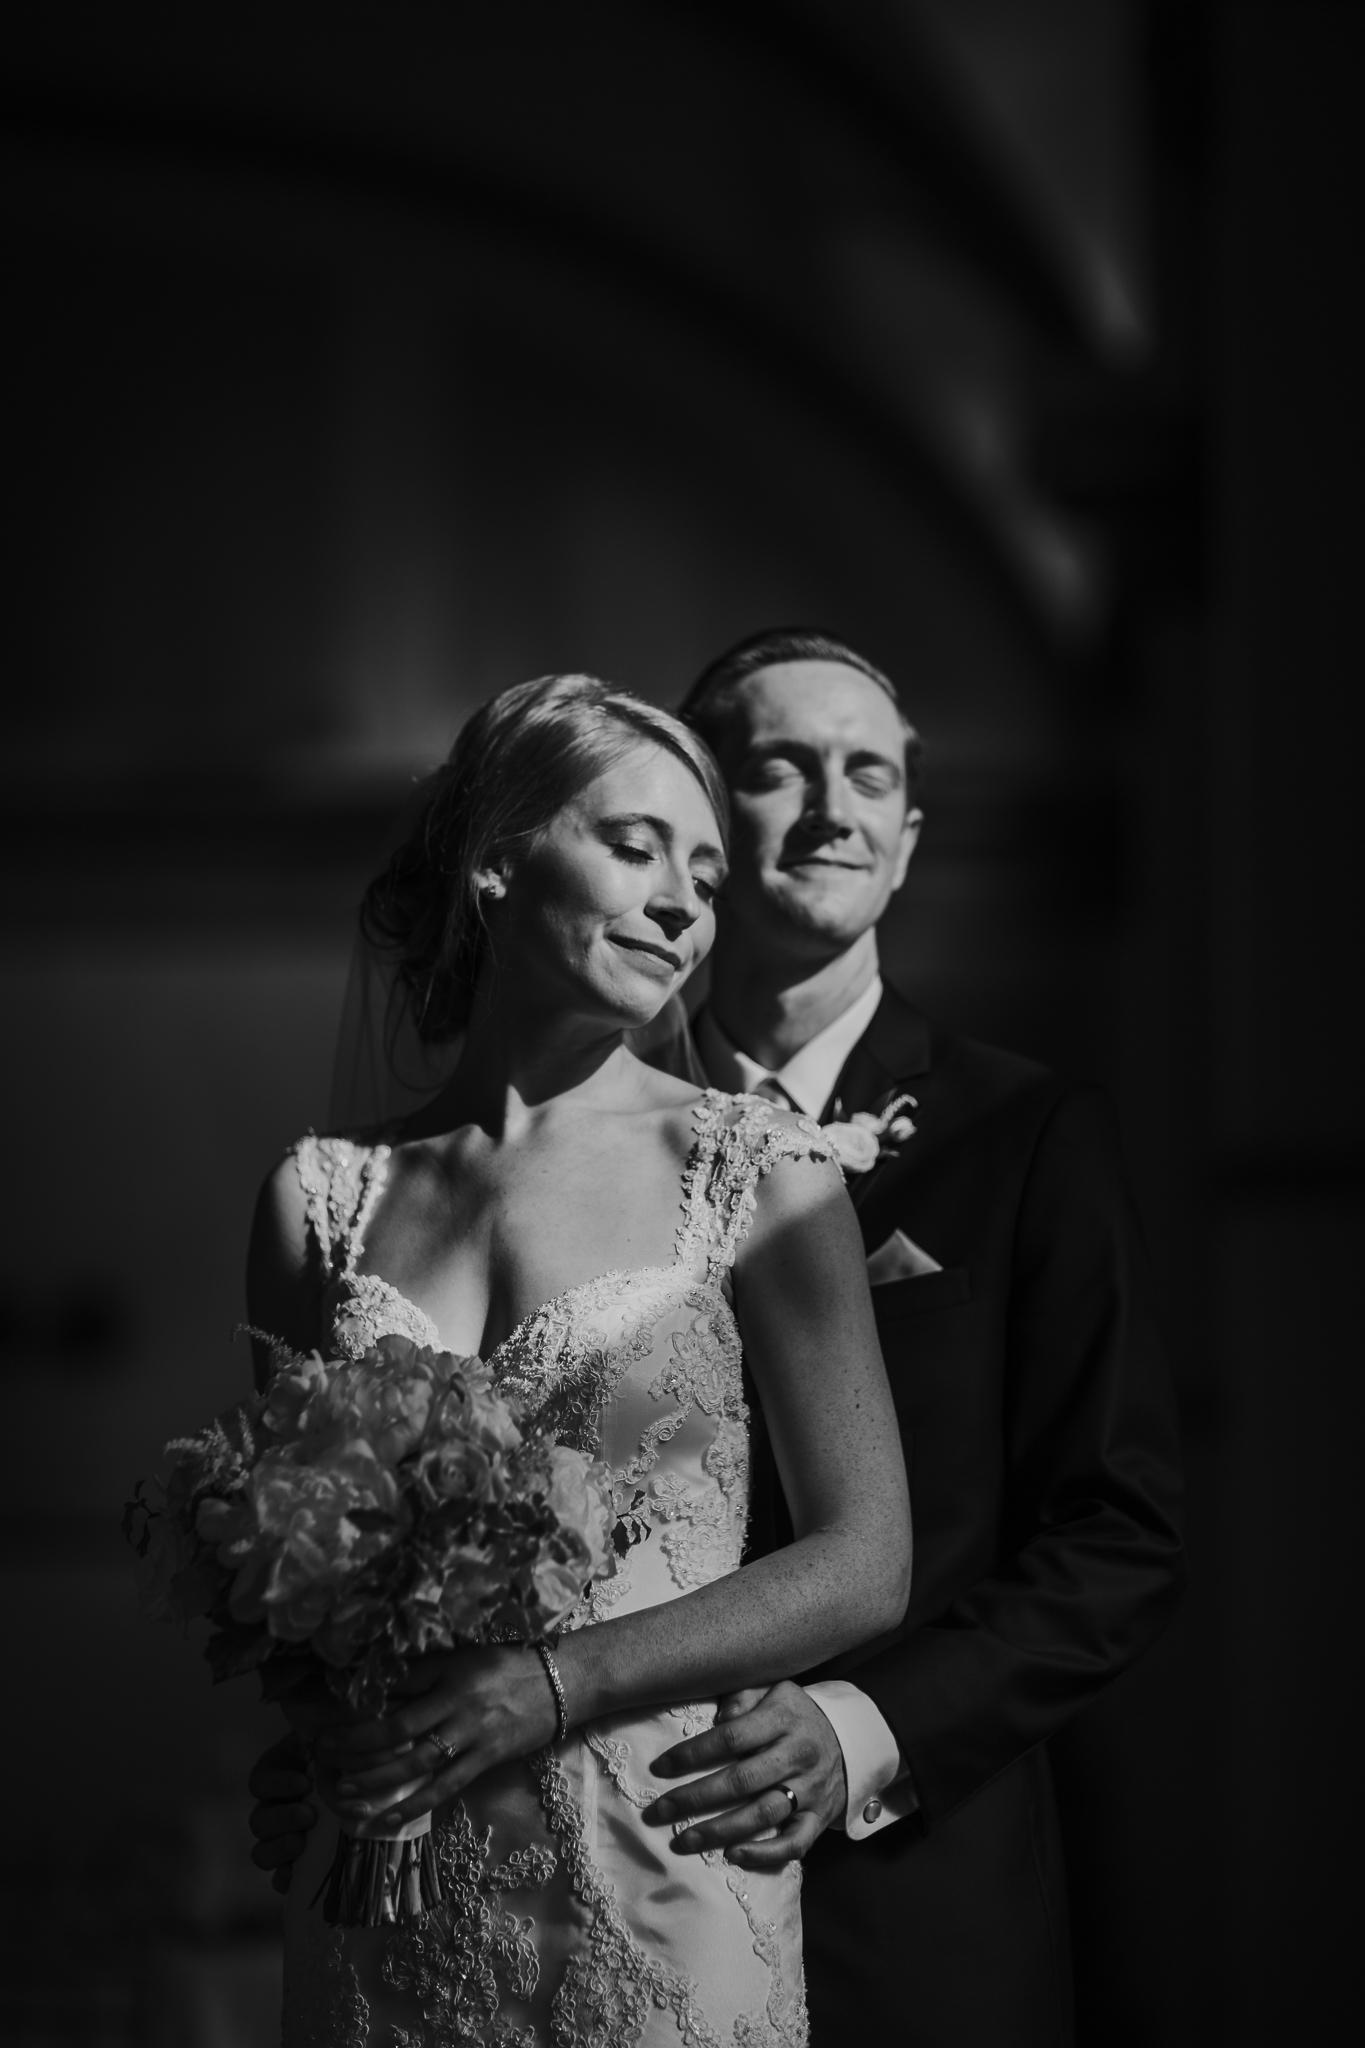 Michael and Kelly - the ashton depot - wedding DFW - wedding photographer- elizalde photography (64 of 150).jpg